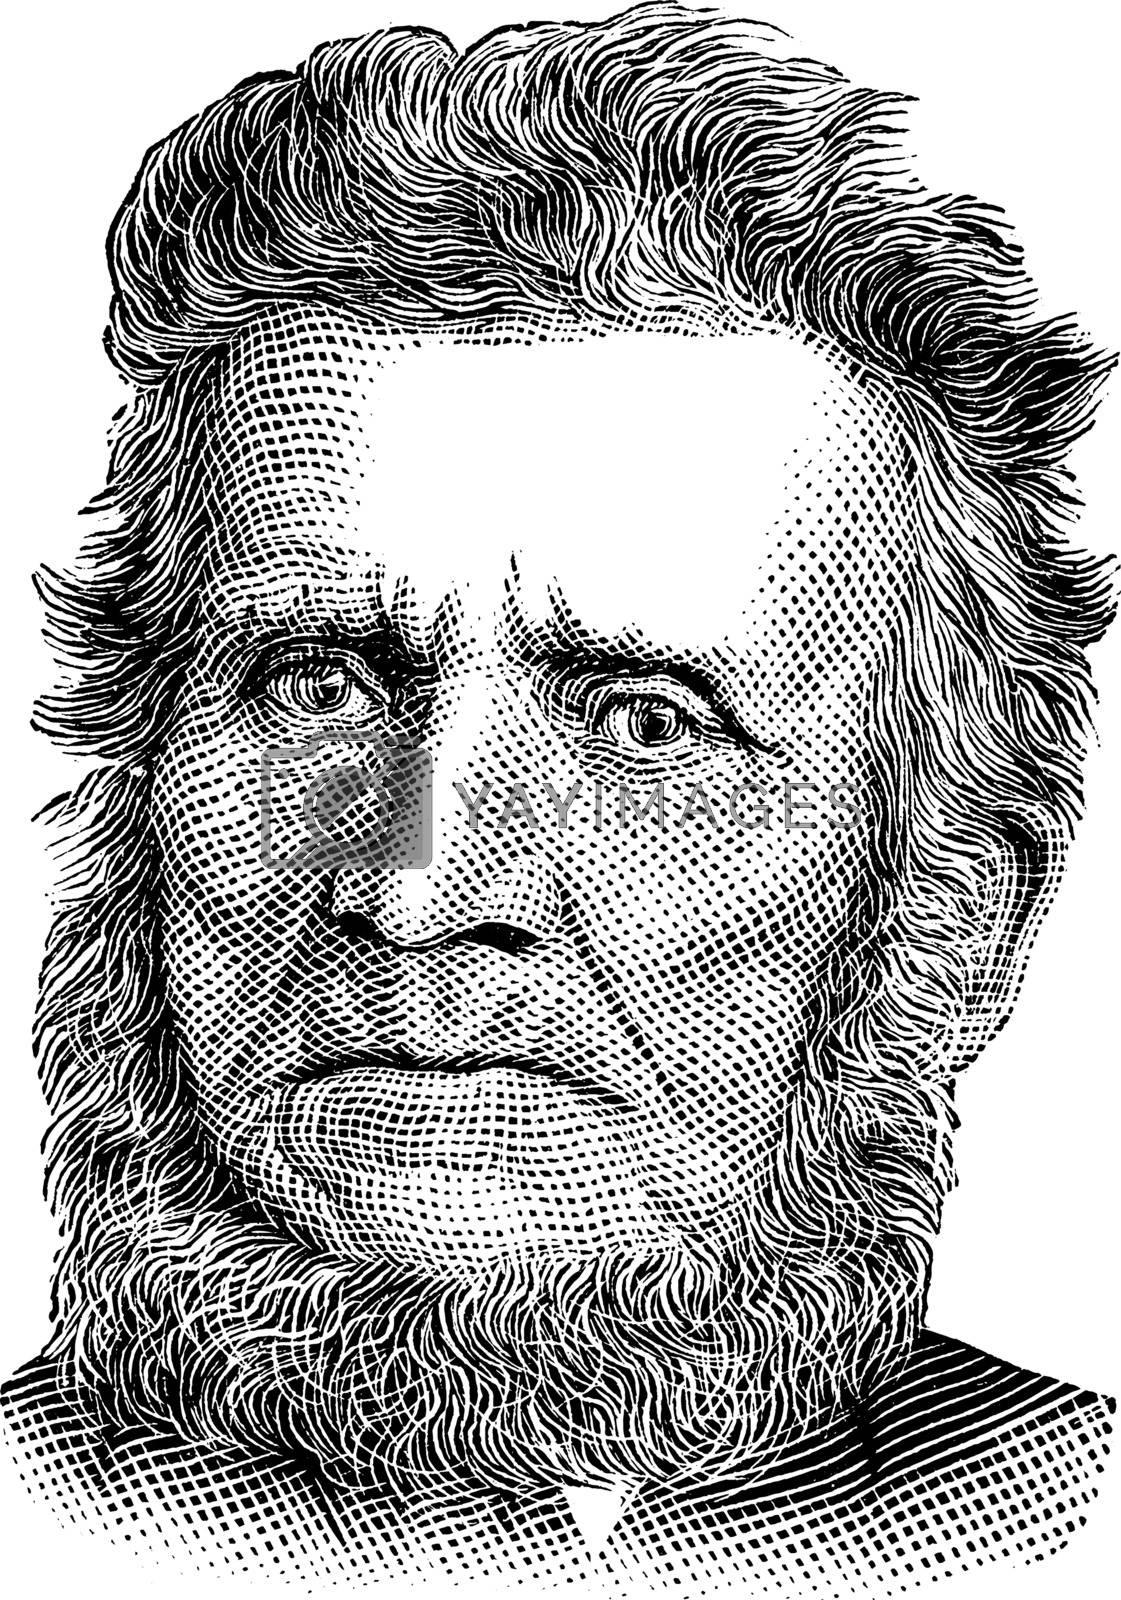 John Brown, vintage illustration by Morphart